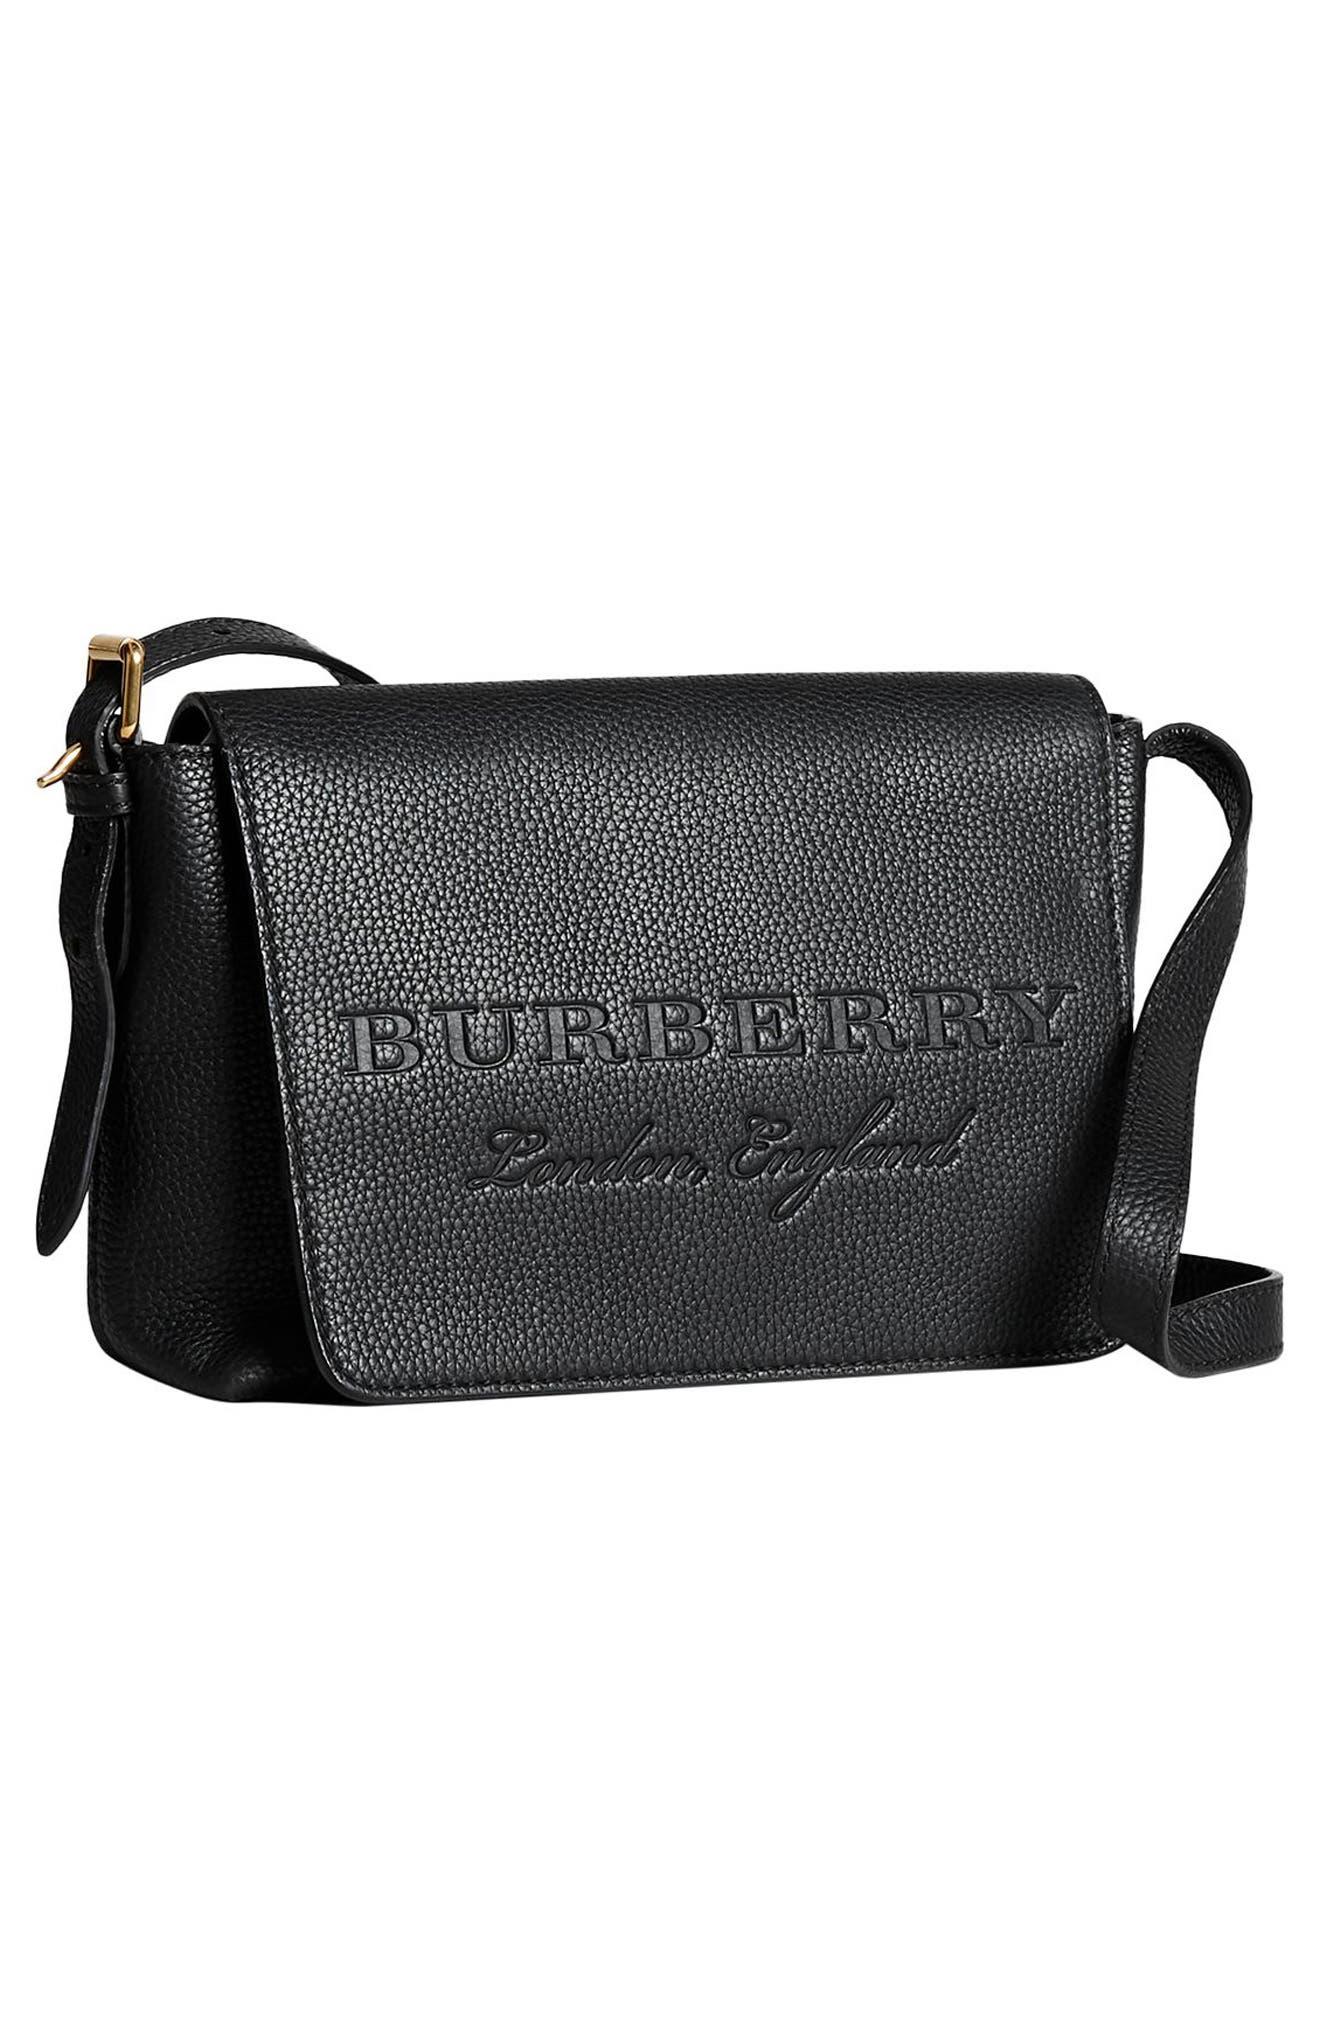 Small Burleigh Leather Crossbody Bag,                             Alternate thumbnail 5, color,                             001